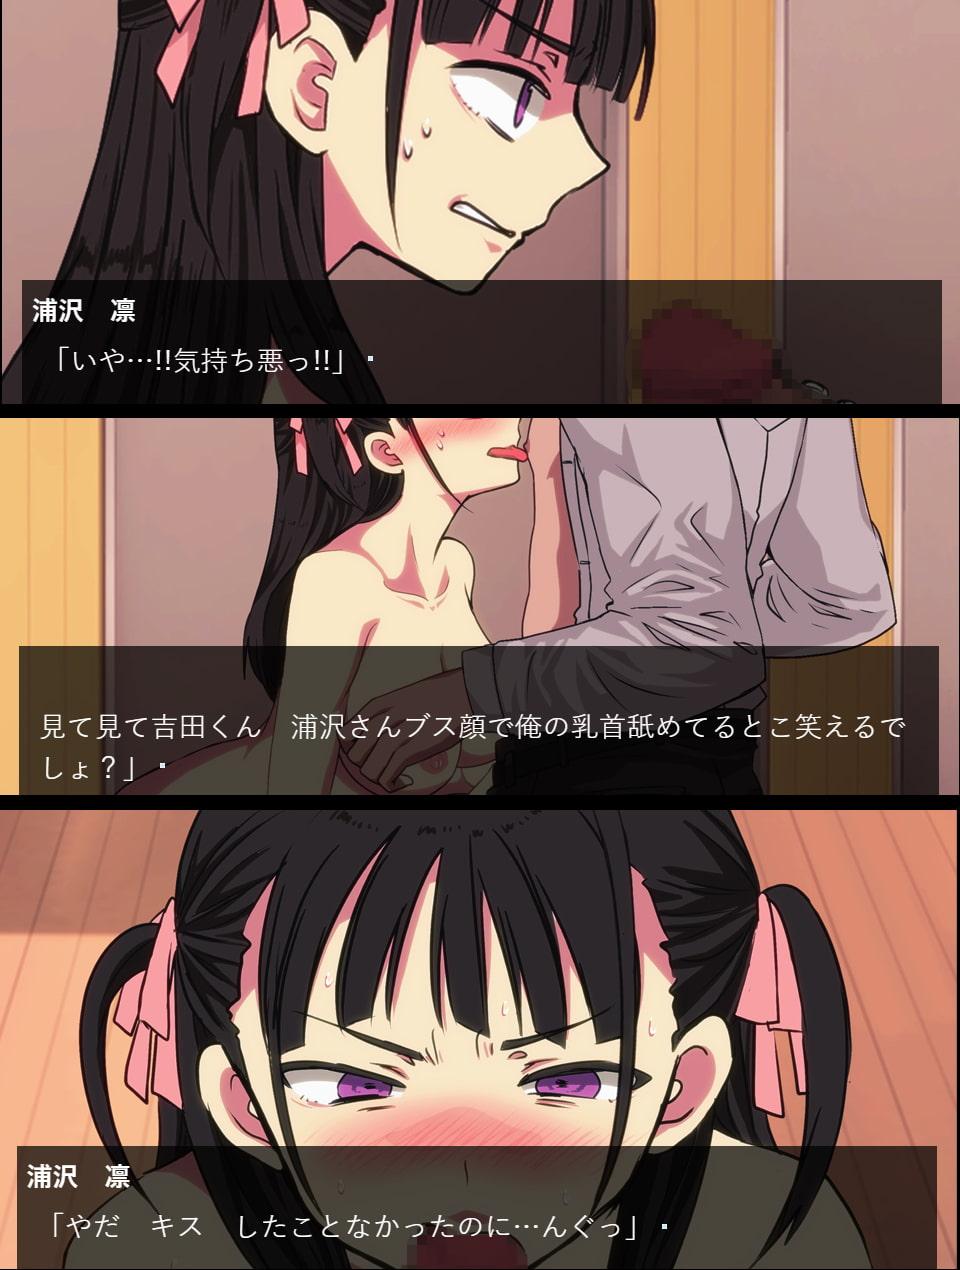 【CG+ゲーム版】俺をいじめたあの女(※オタサーの姫)をわからせ ~催眠使われ無様晒してアヘ顔土下座の本気謝罪~